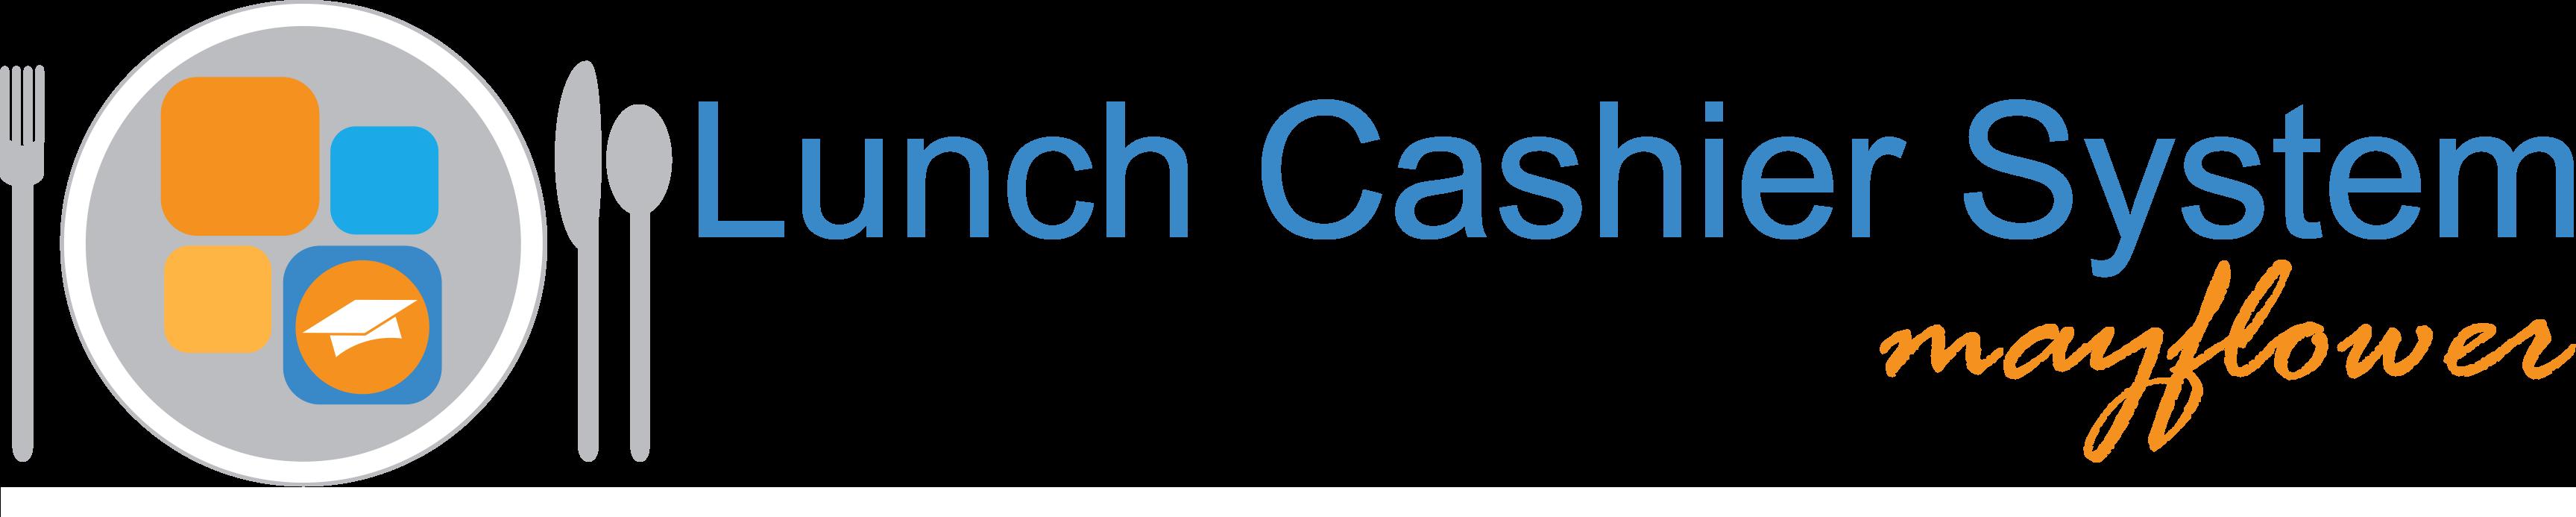 Lunch Cashier System